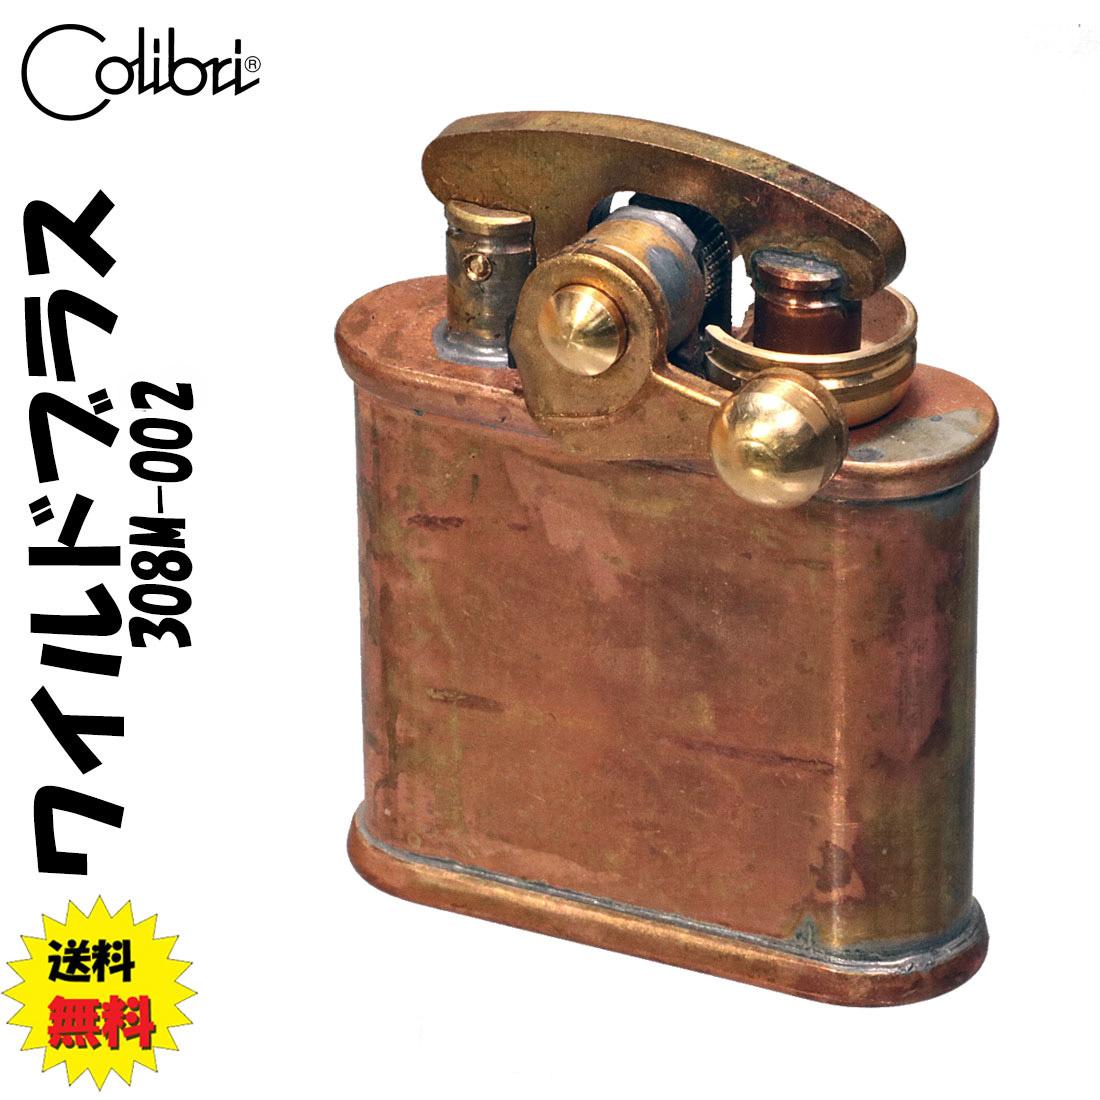 Colibri(コリブリ) 日本製 オイルライター ワイルドブラスモデル